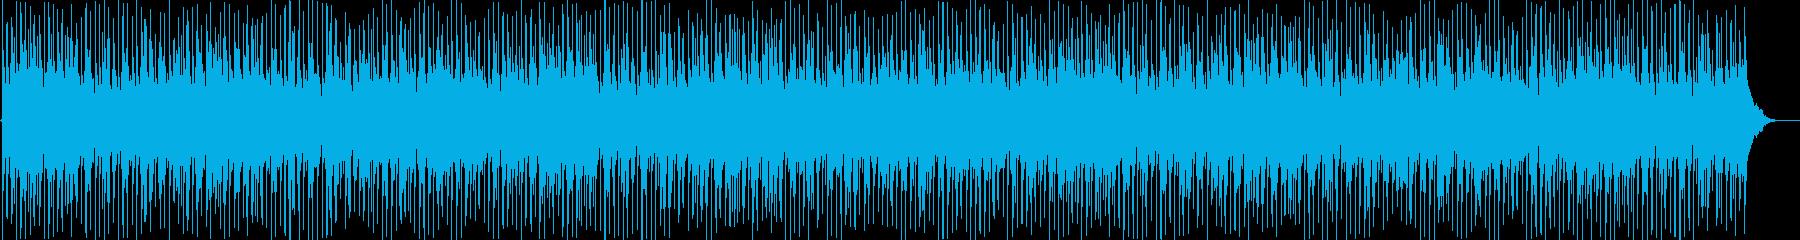 Happy Ukulele 14の再生済みの波形